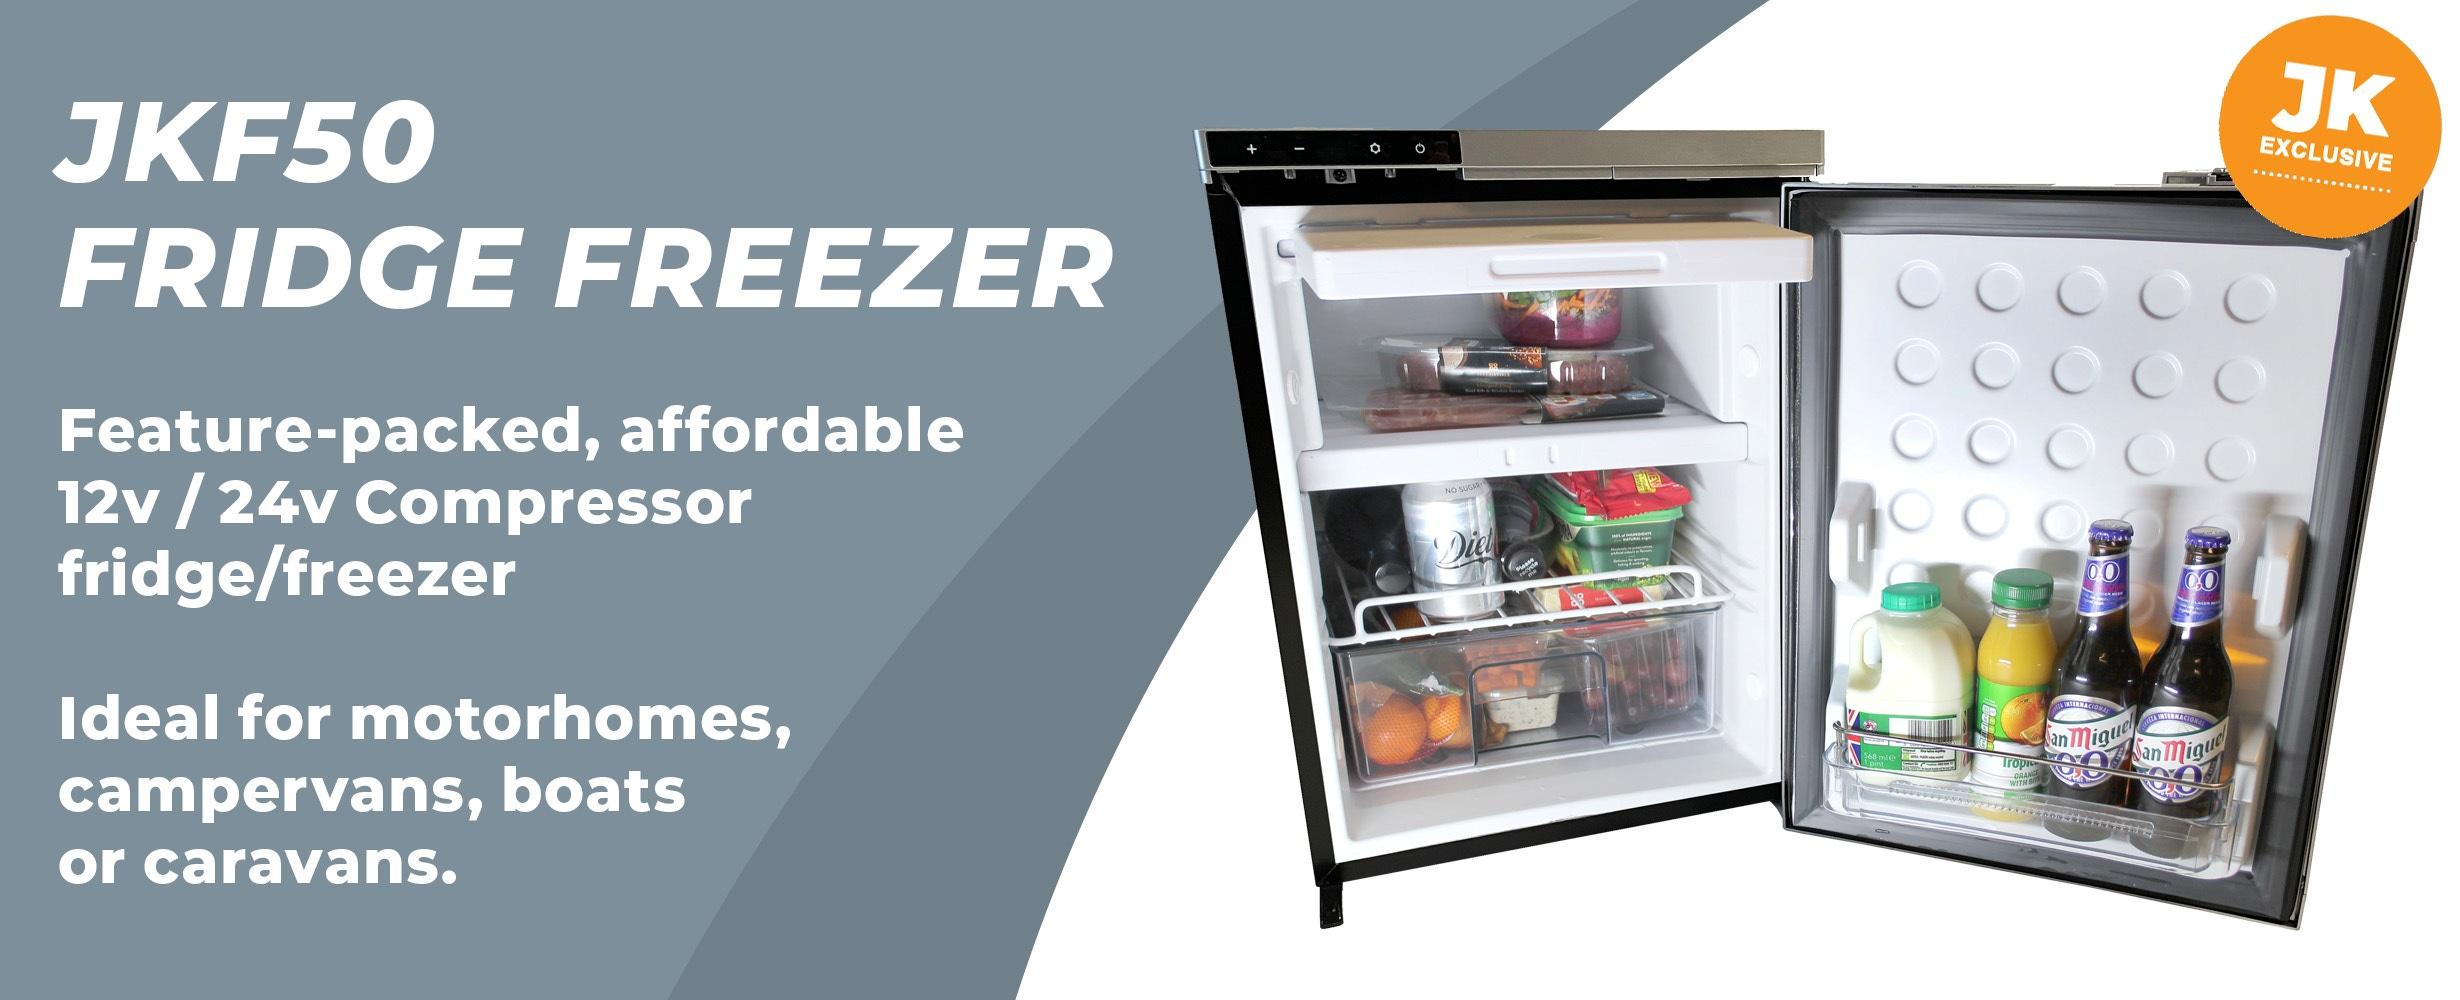 JKF50 Fridge Freezer